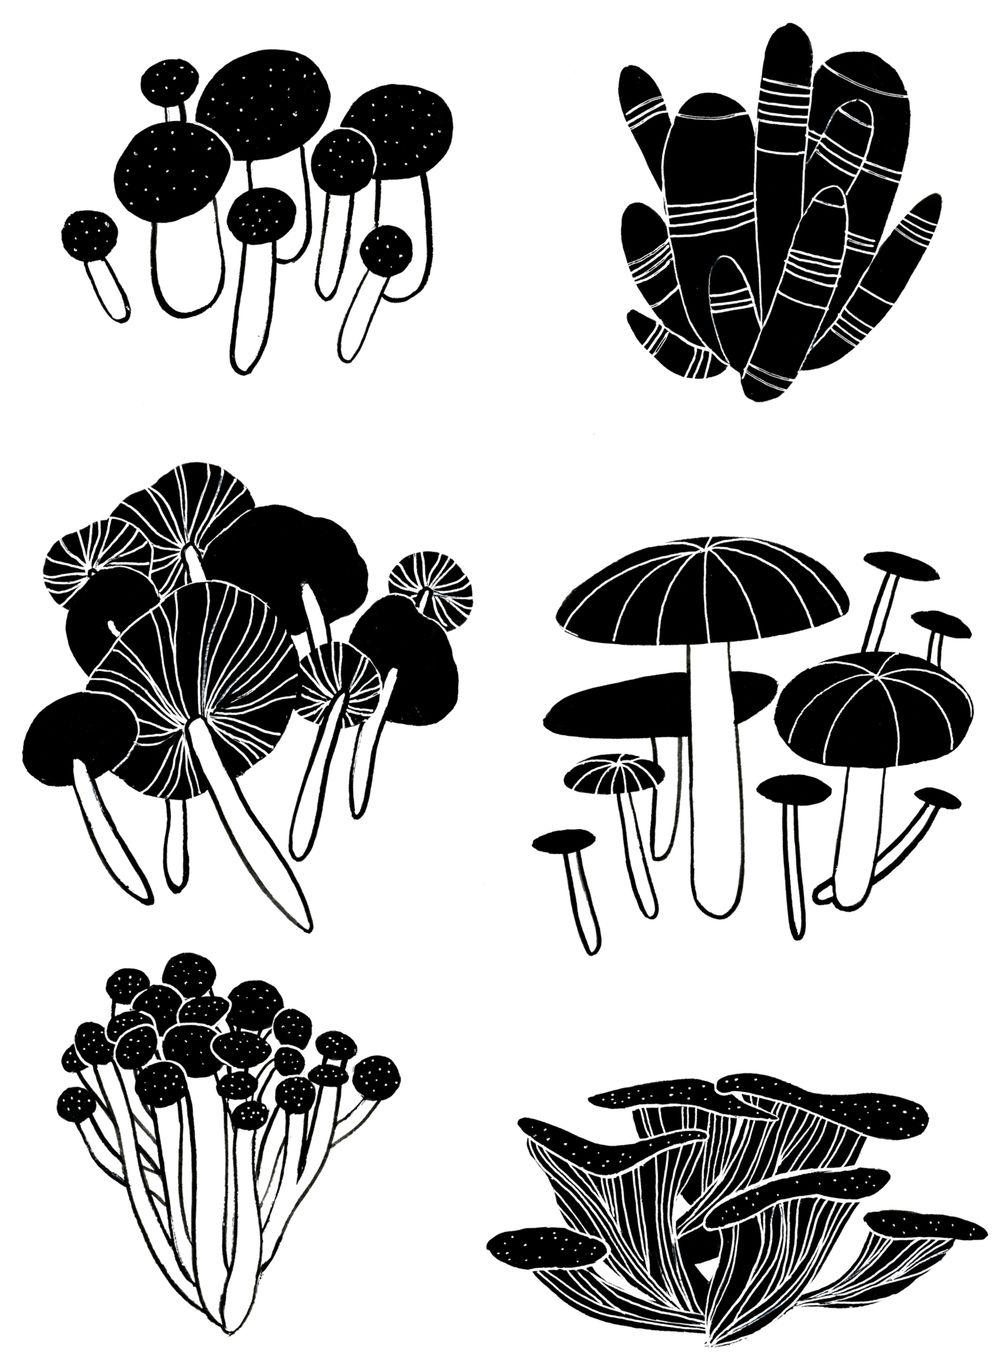 Mushroom Medley - image 7 - student project